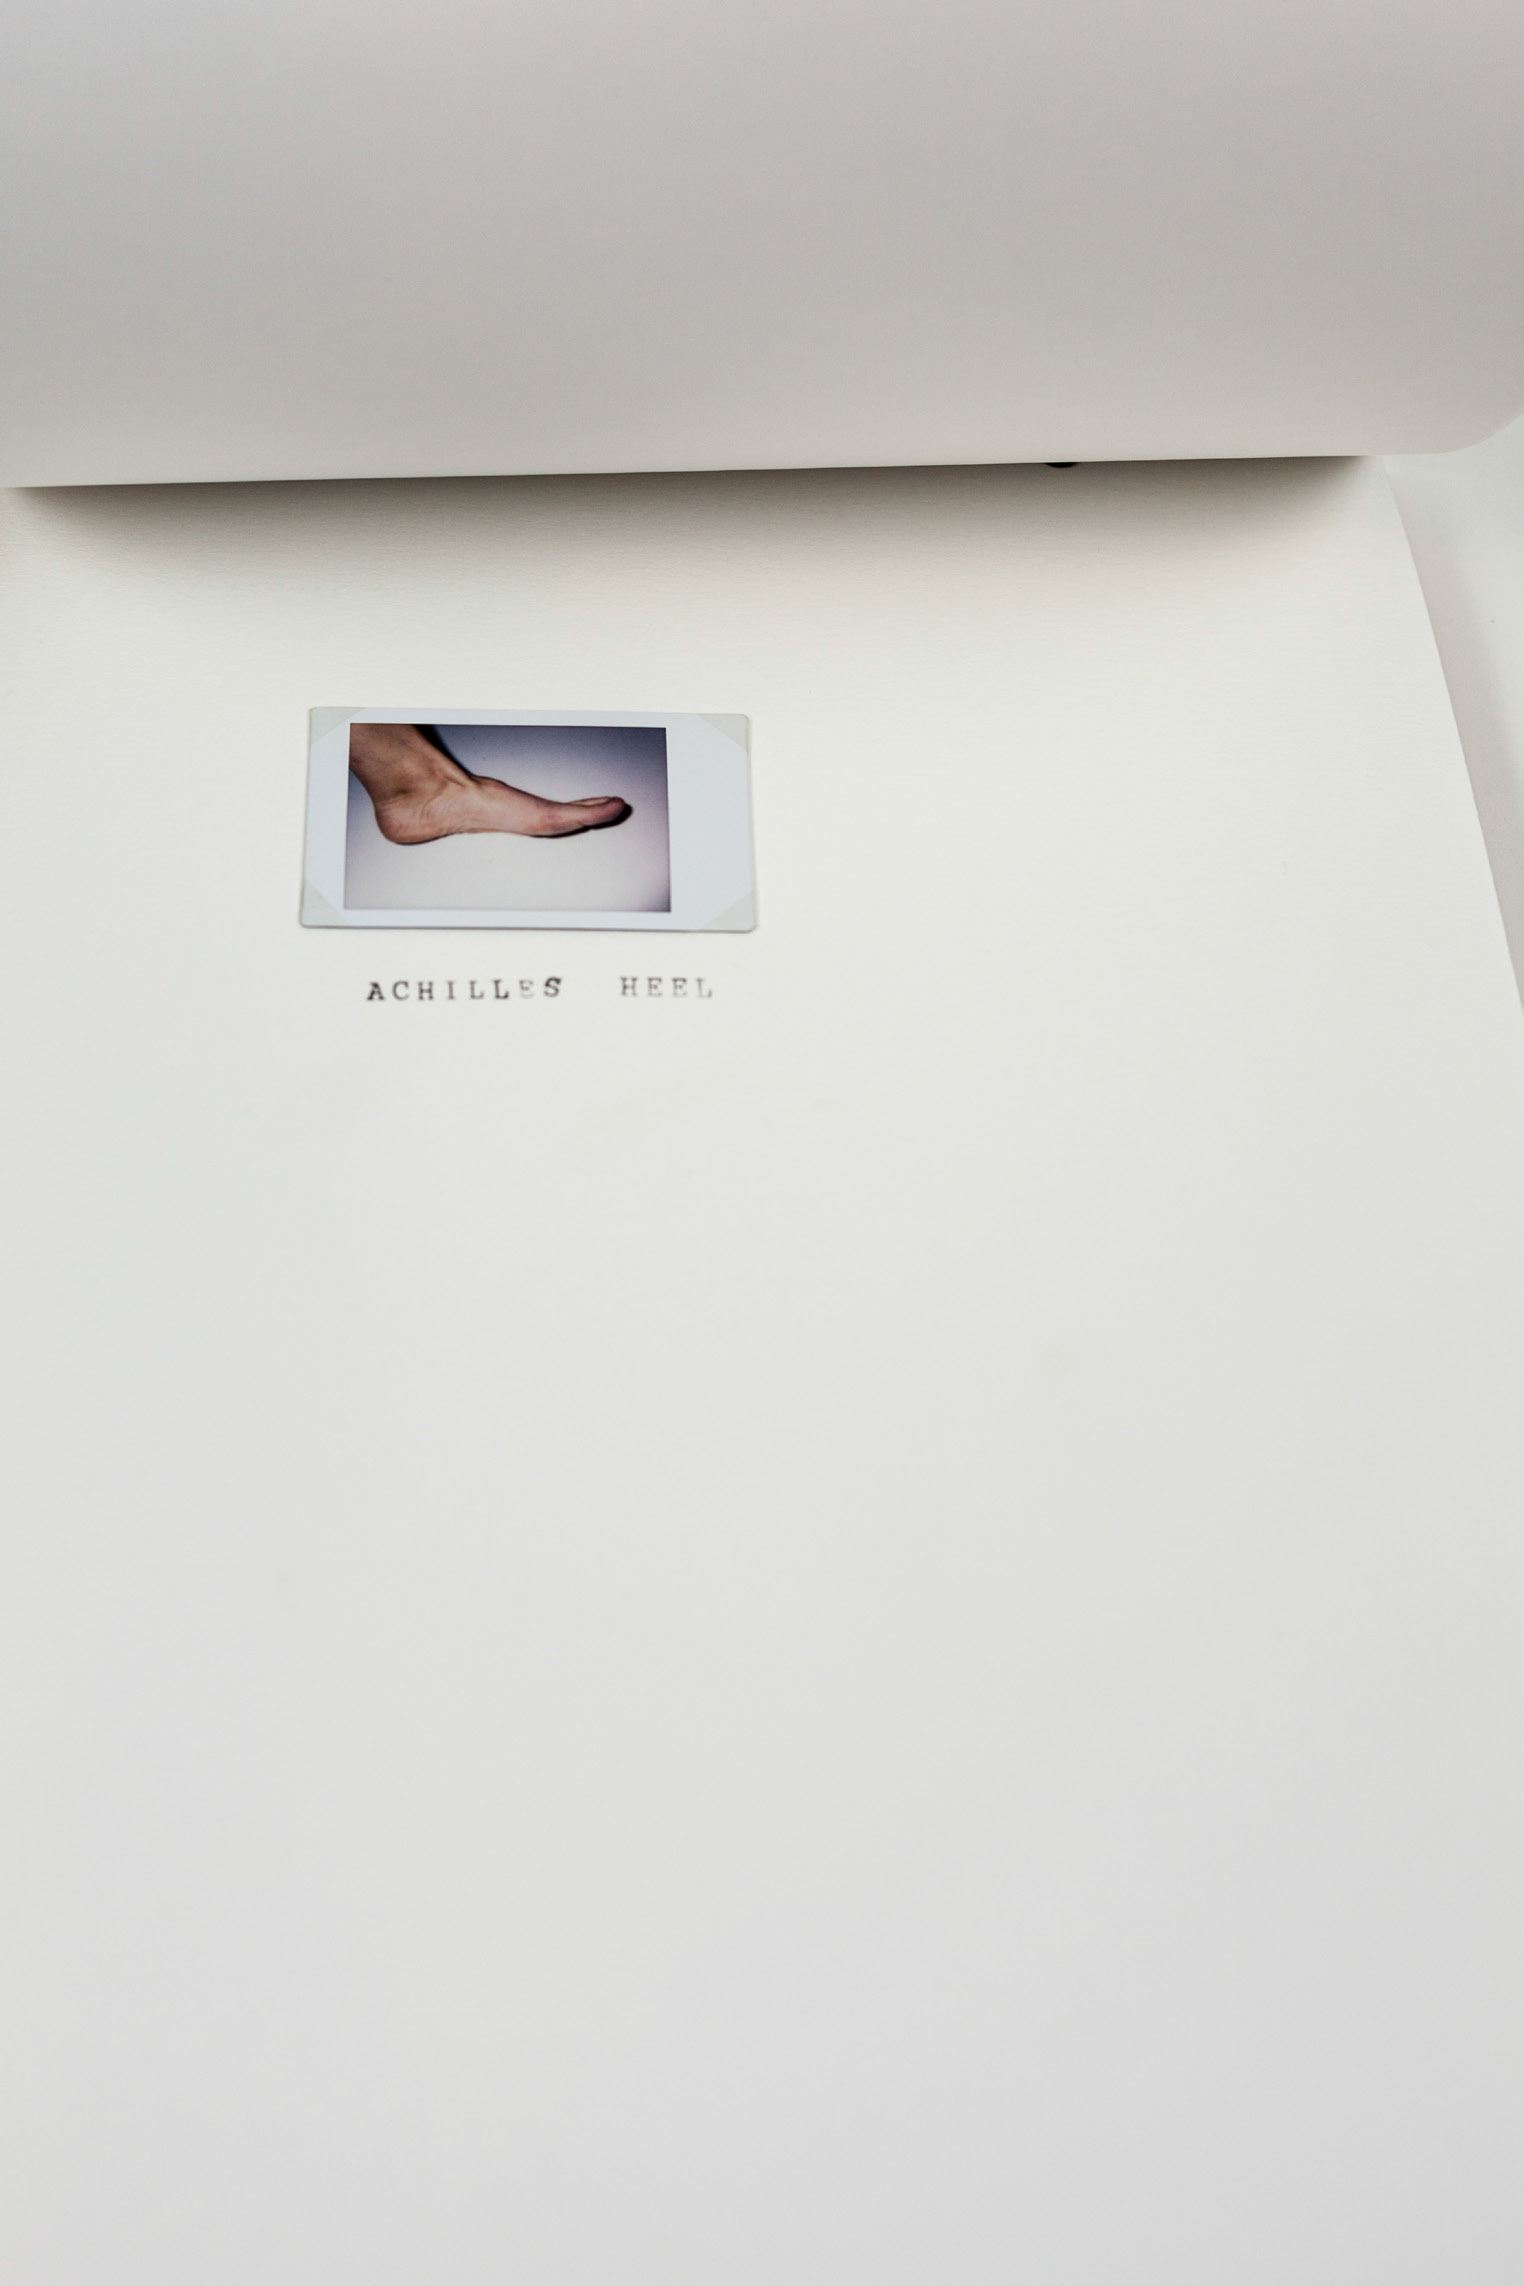 Carolina-Pimenta-One-Shot-Artist-book_019.jpg